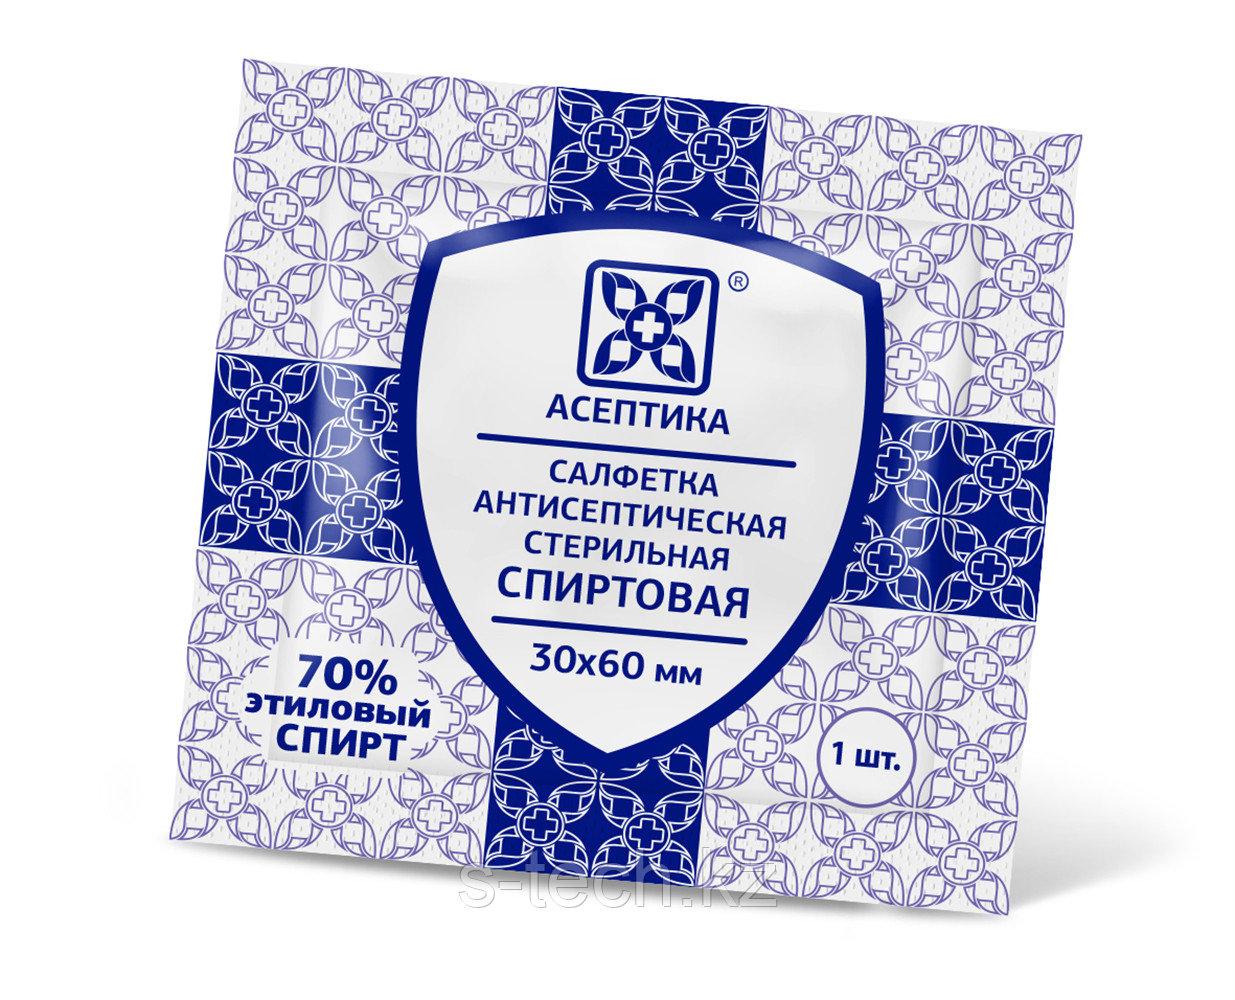 Салфетка антисептическая спиртовая 56х65 мм